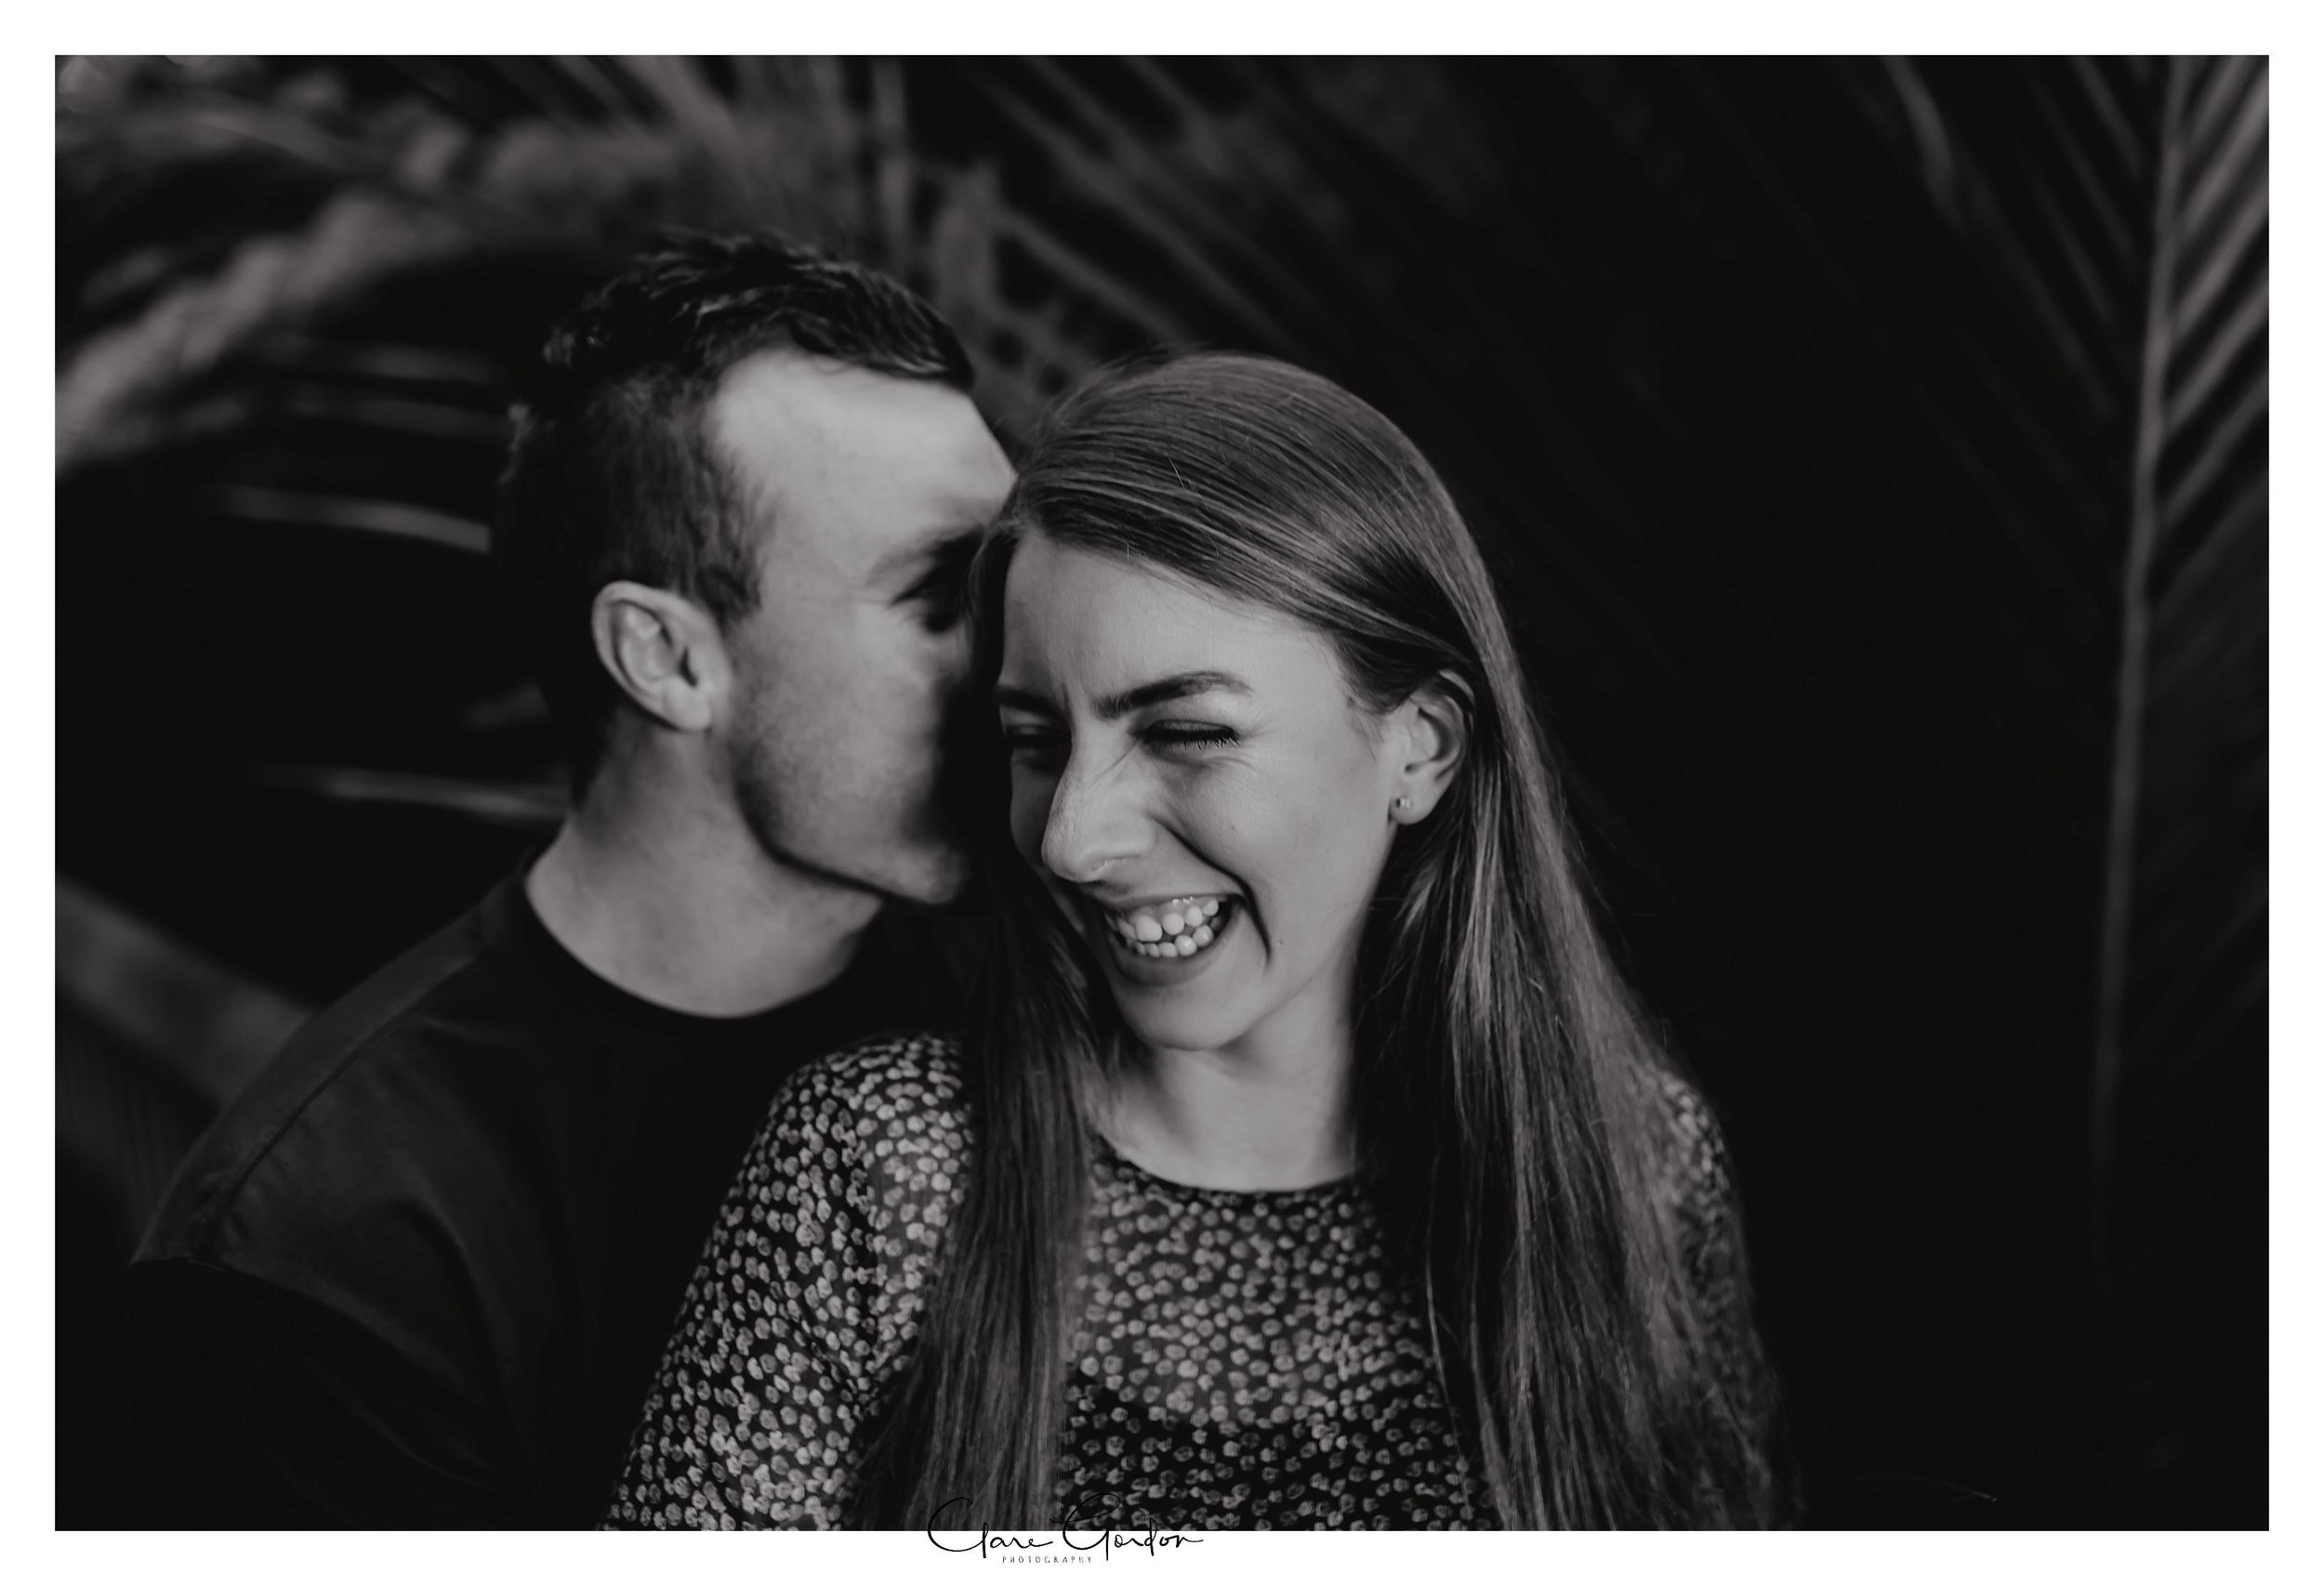 Shaun-Celine-taitua-arboretum-engagement-photos-newzealand-wedding-photographer-waikato-wedding-photographer-waikato-wedding-photography (4).jpg